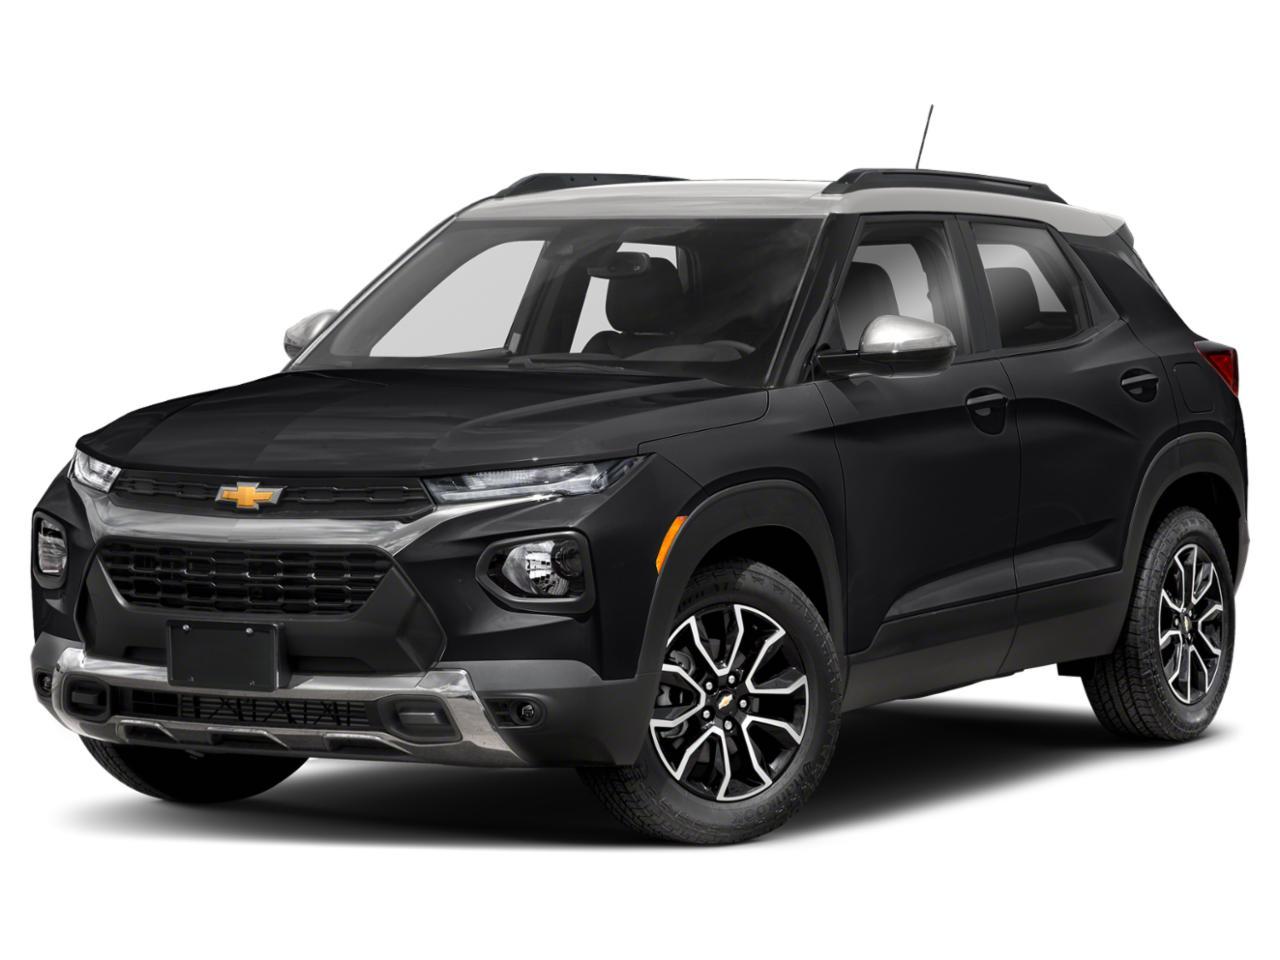 2021 Chevrolet Trailblazer Vehicle Photo in Minocqua, WI 54548